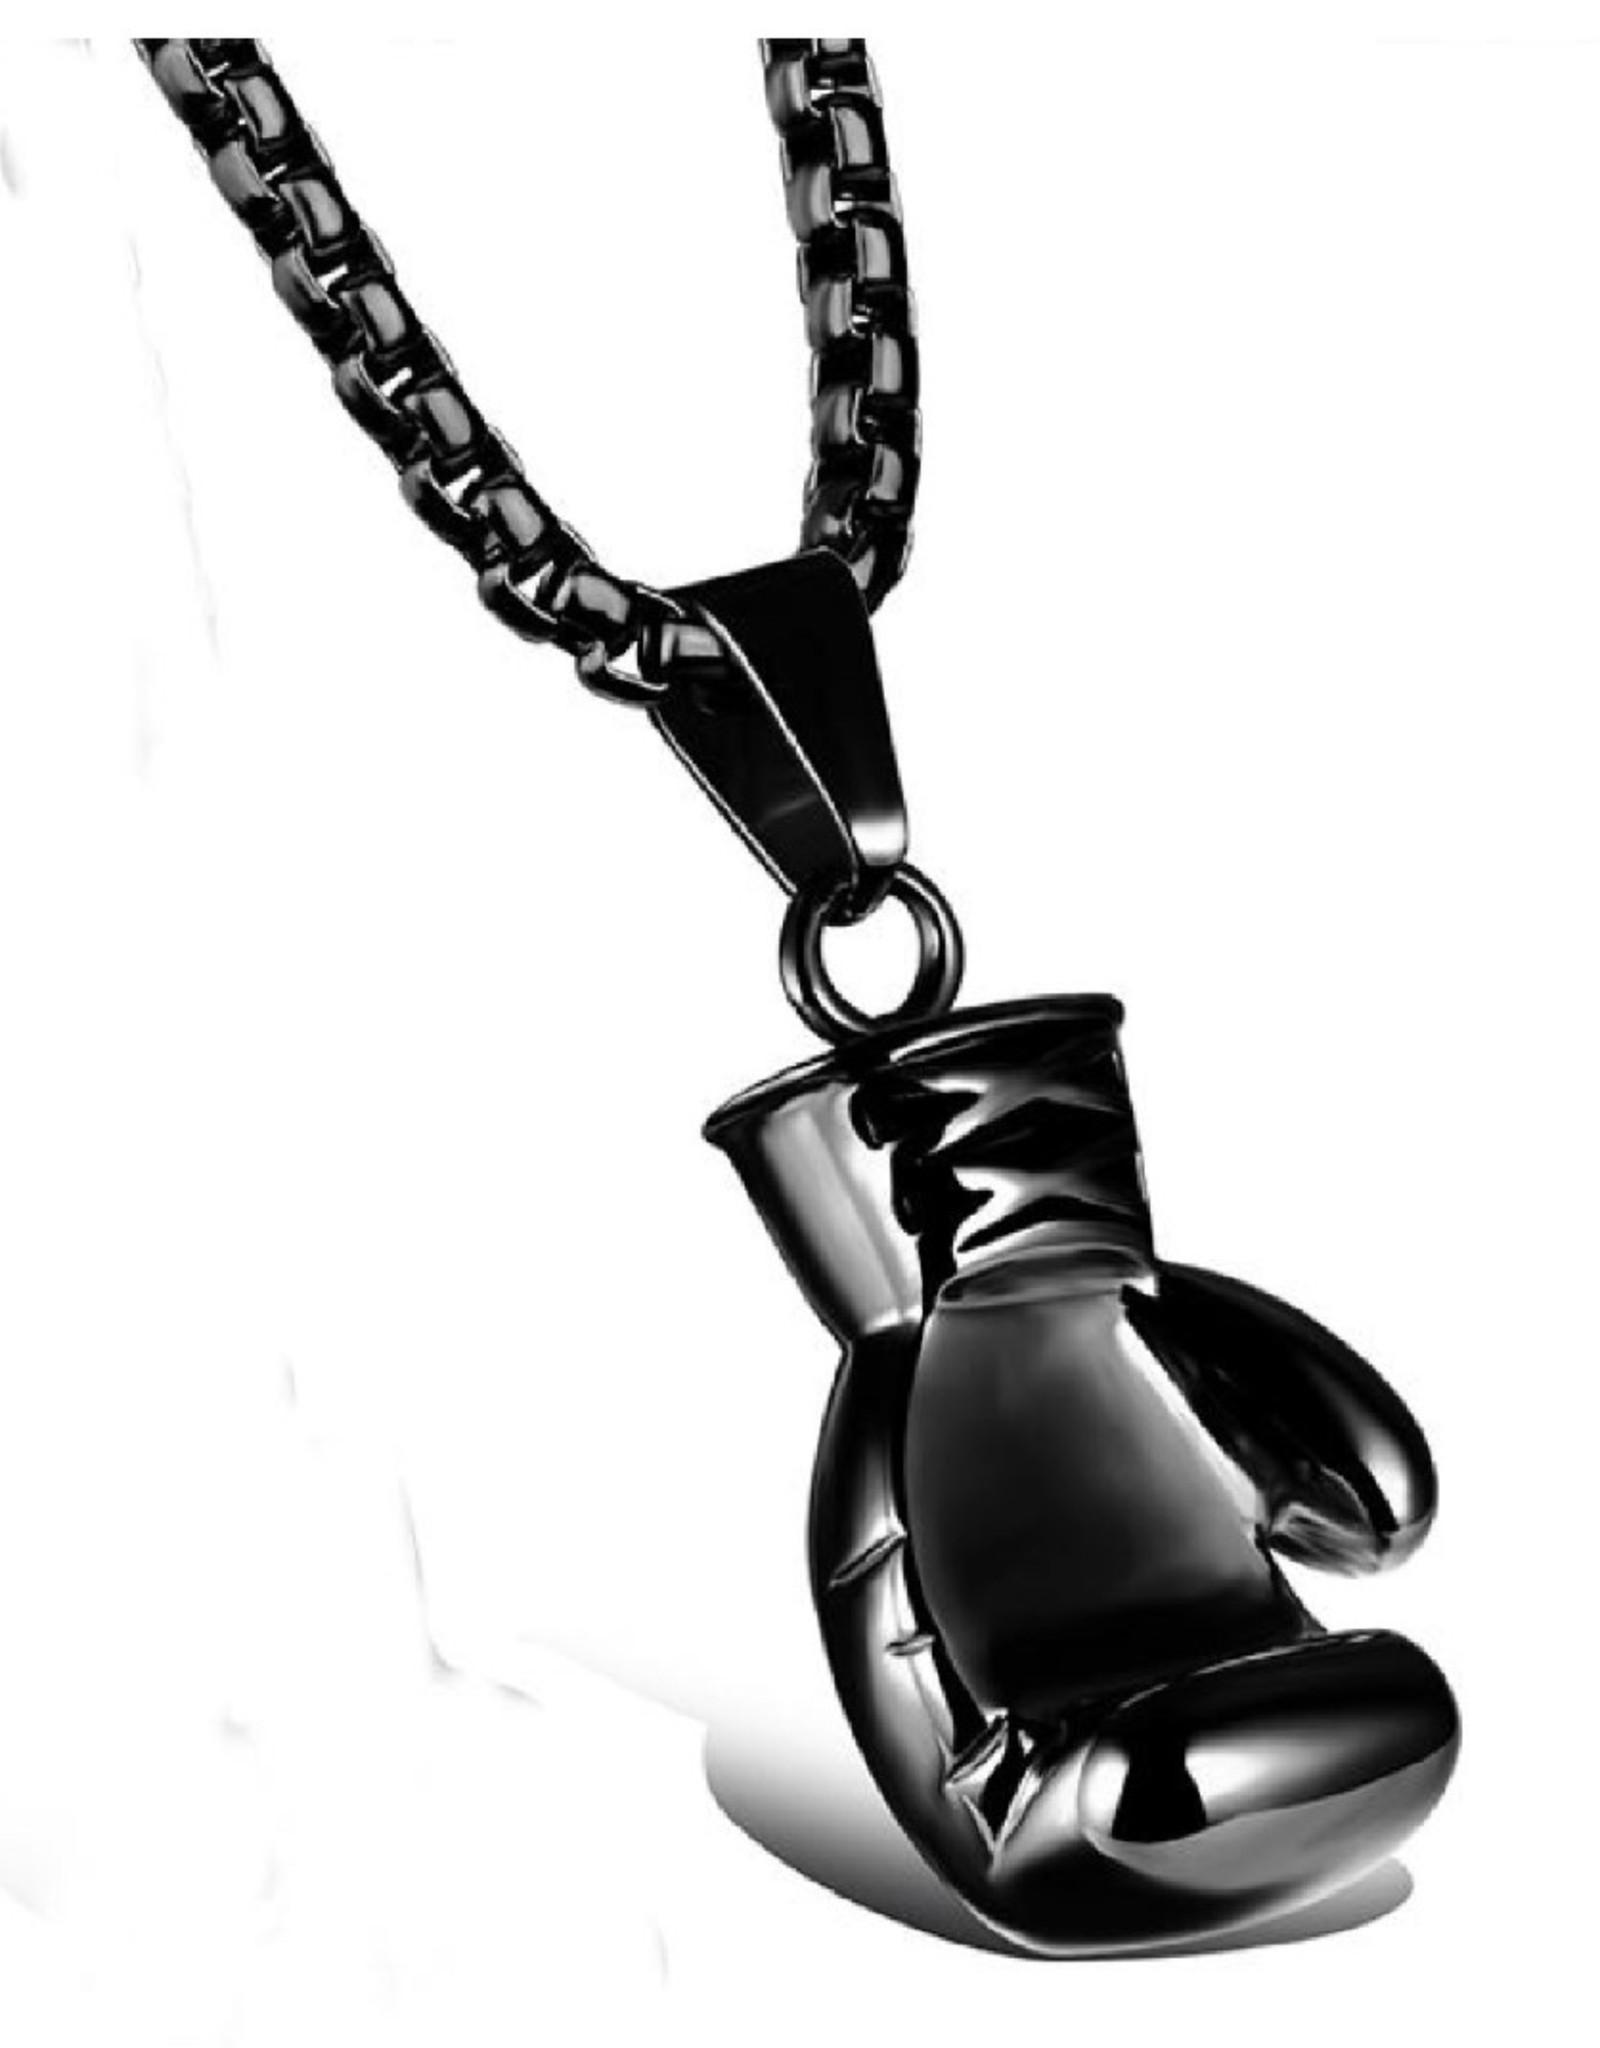 Guangzhou Nuevoenergia Jewelry Co. Black Boxing Glove Pendant w/Chain